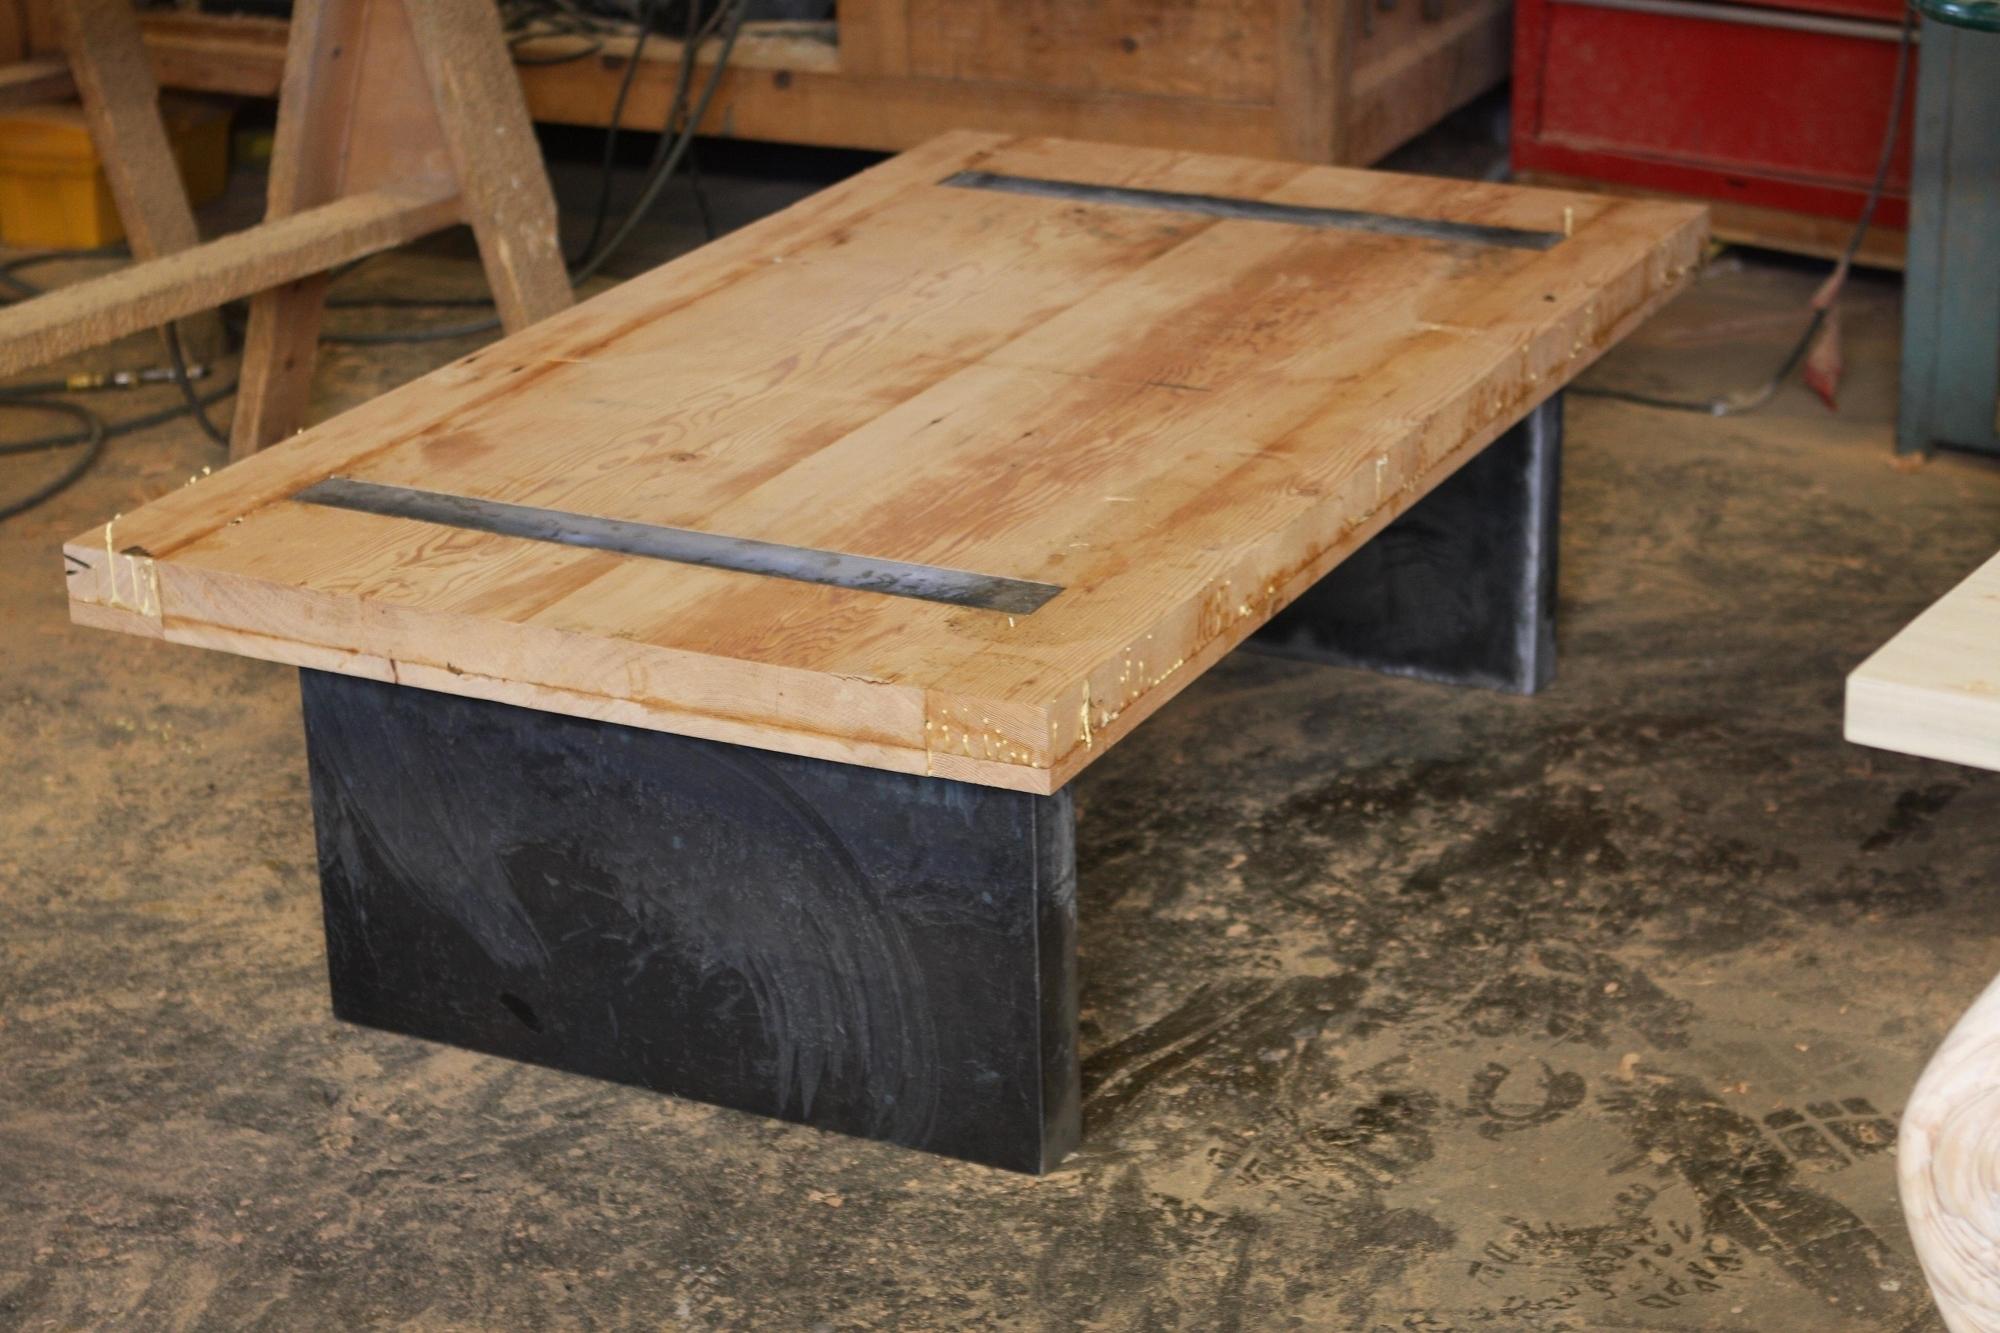 Modern Rustic Coffee Table – Coffee Table Ideas Throughout Modern Rustic Coffee Tables (View 10 of 30)